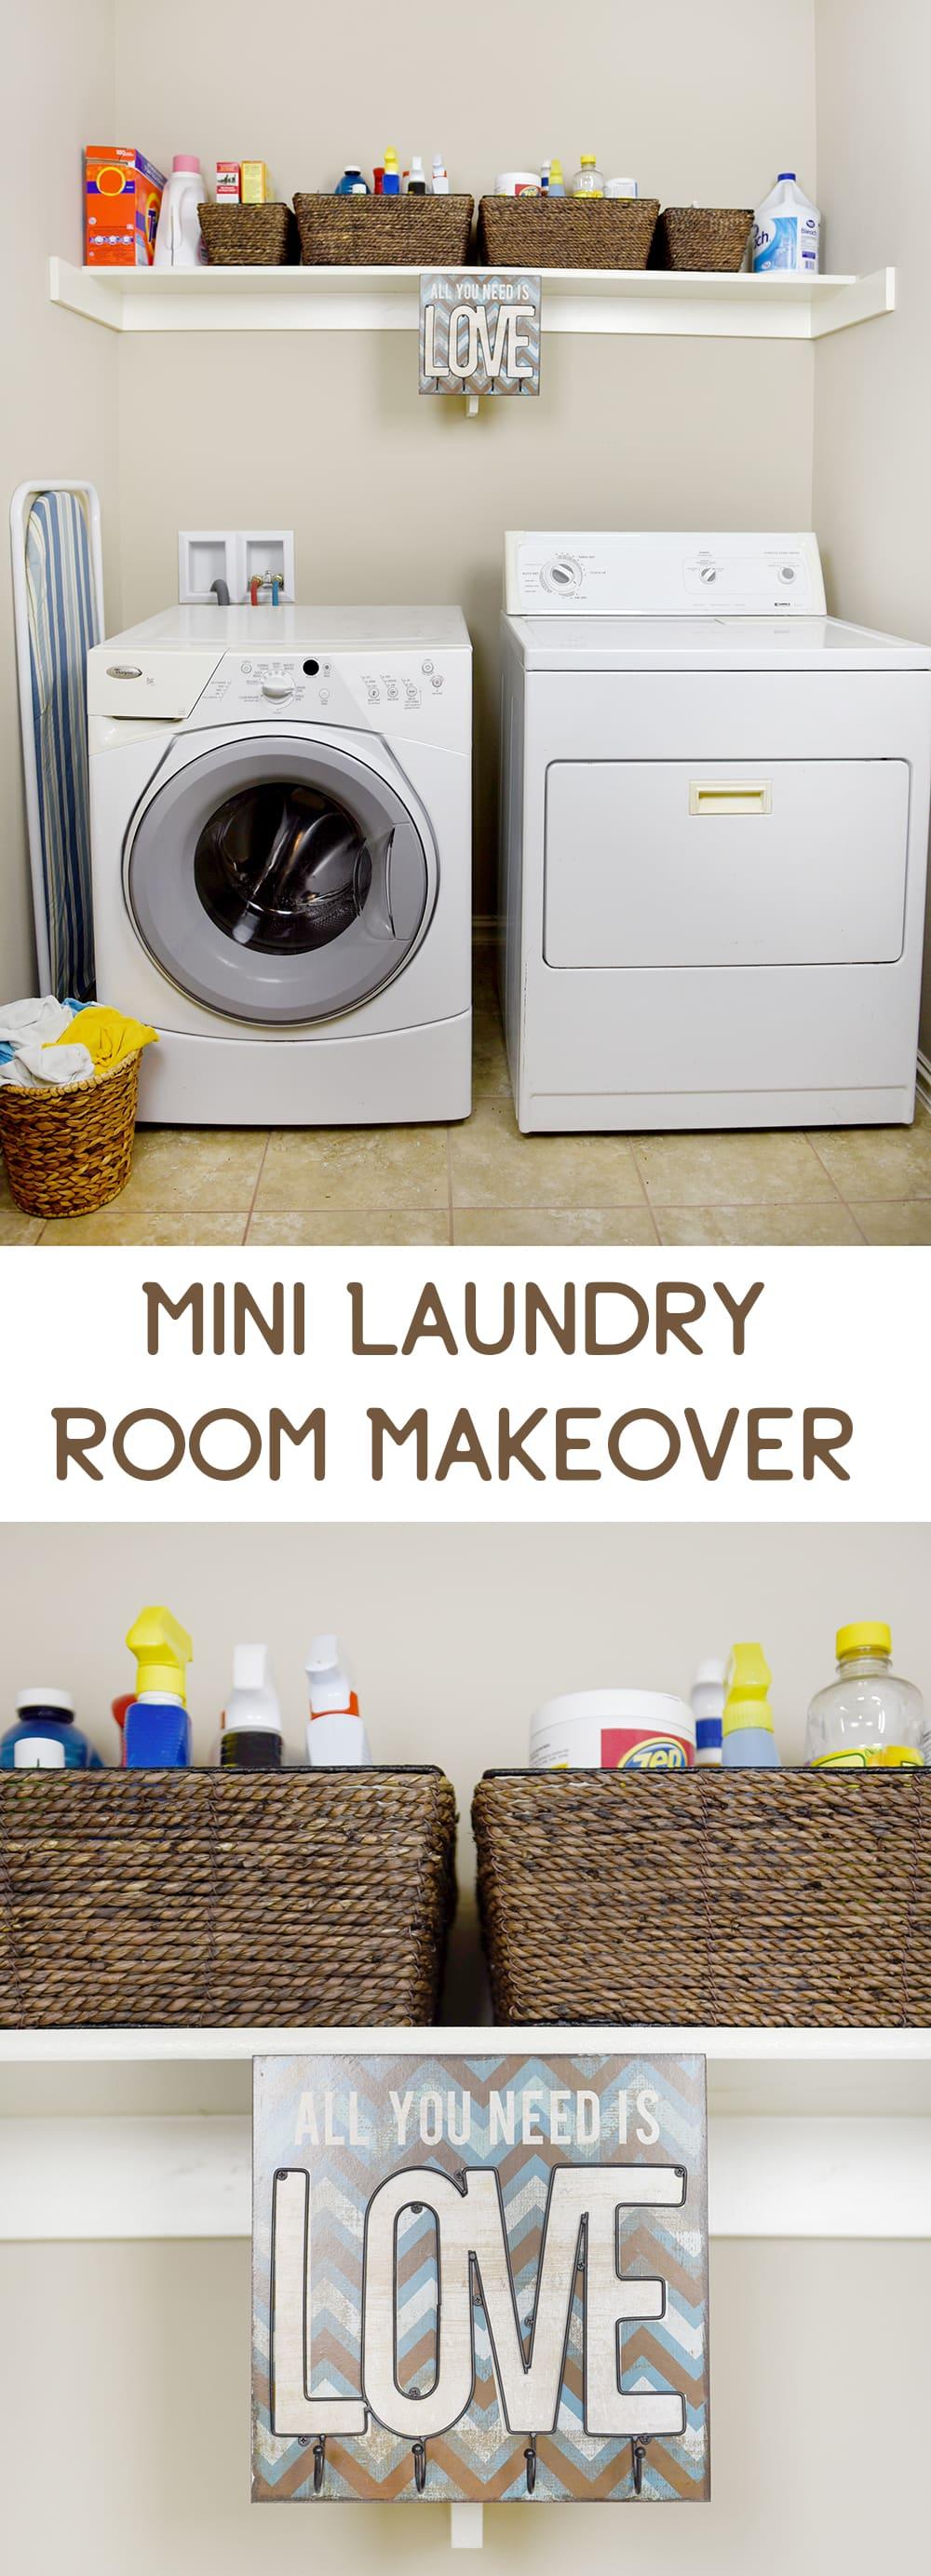 Mini Laundry Room Makeover!